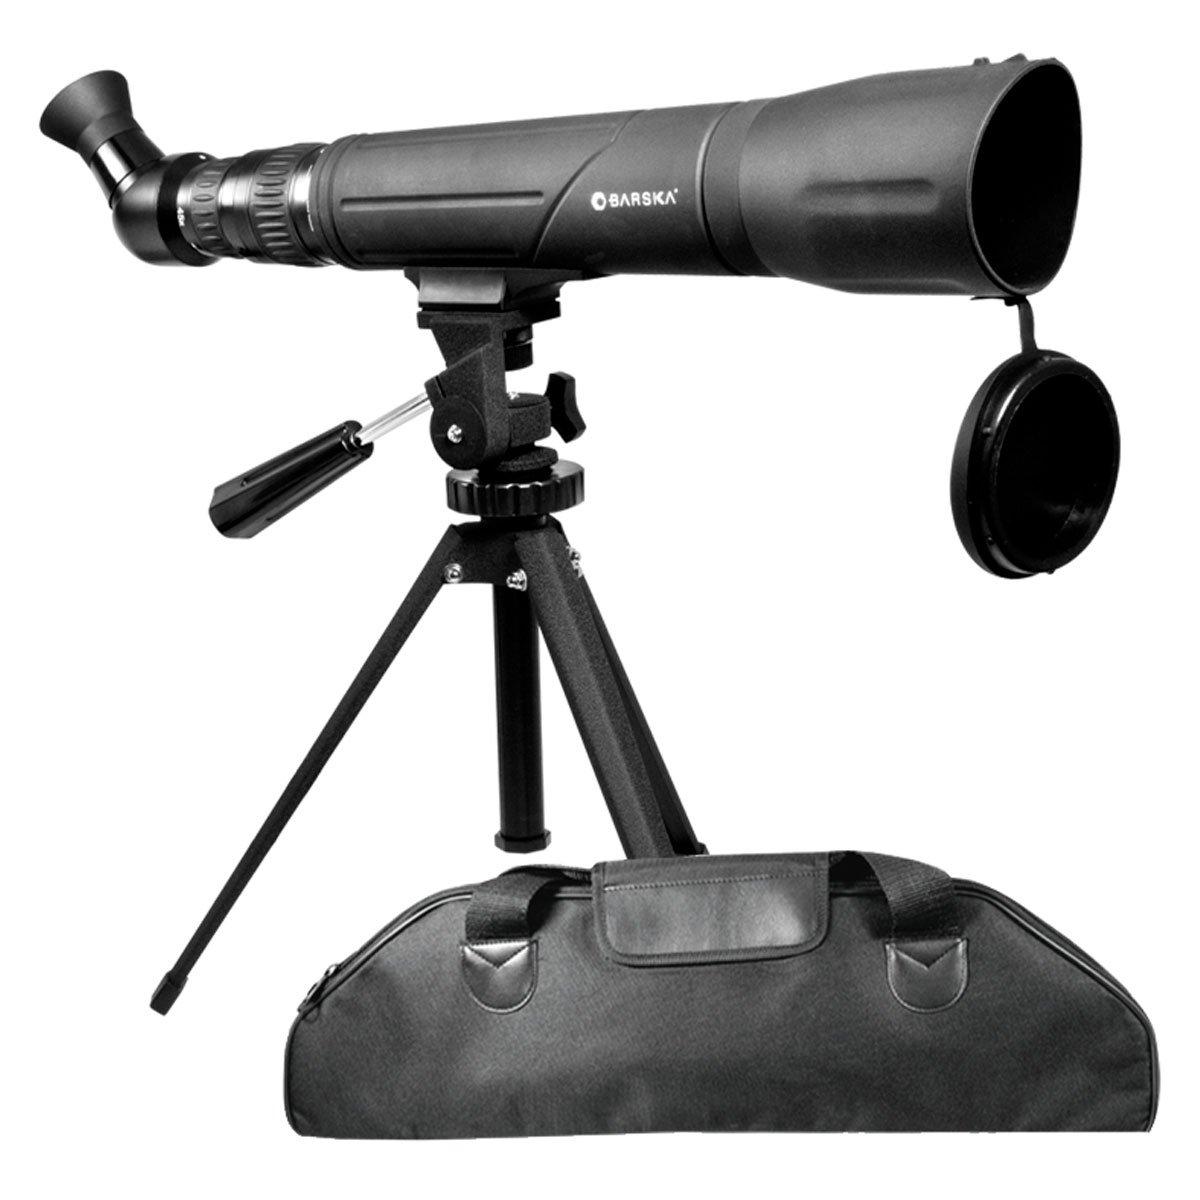 BARSKA 20-60x60 Spotter SV Angled & Rotatable Spotting Scope w/ Tripod & Soft Case by BARSKA